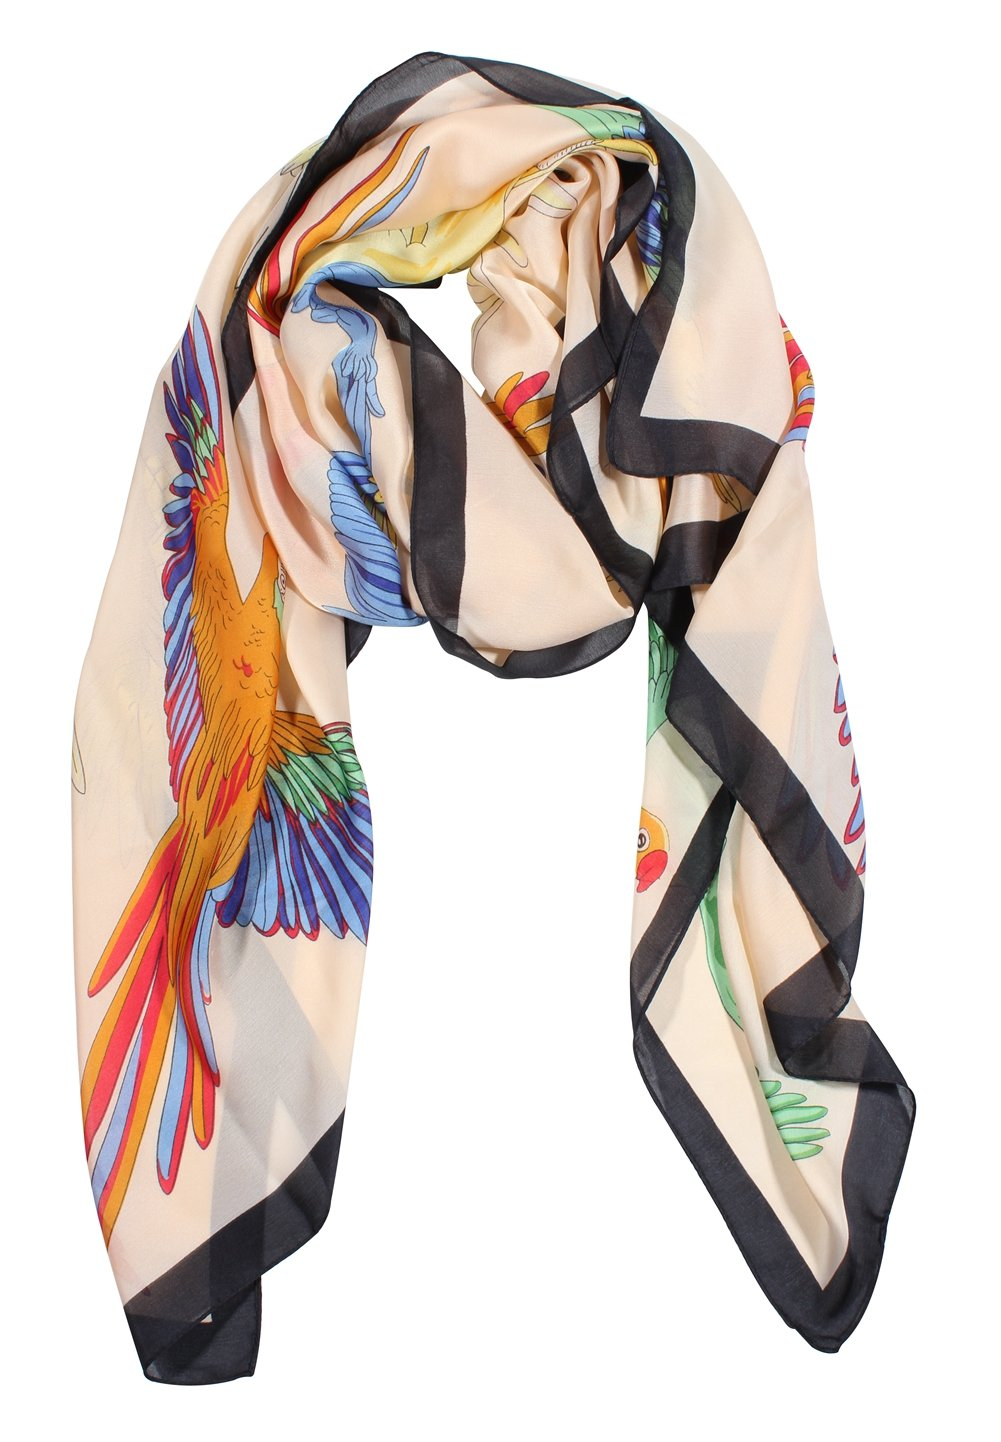 Jaweaver Scarf for Women Large Satin Silk Feeling Beach Sunscreen Shawls Wrap (Brids Beige)